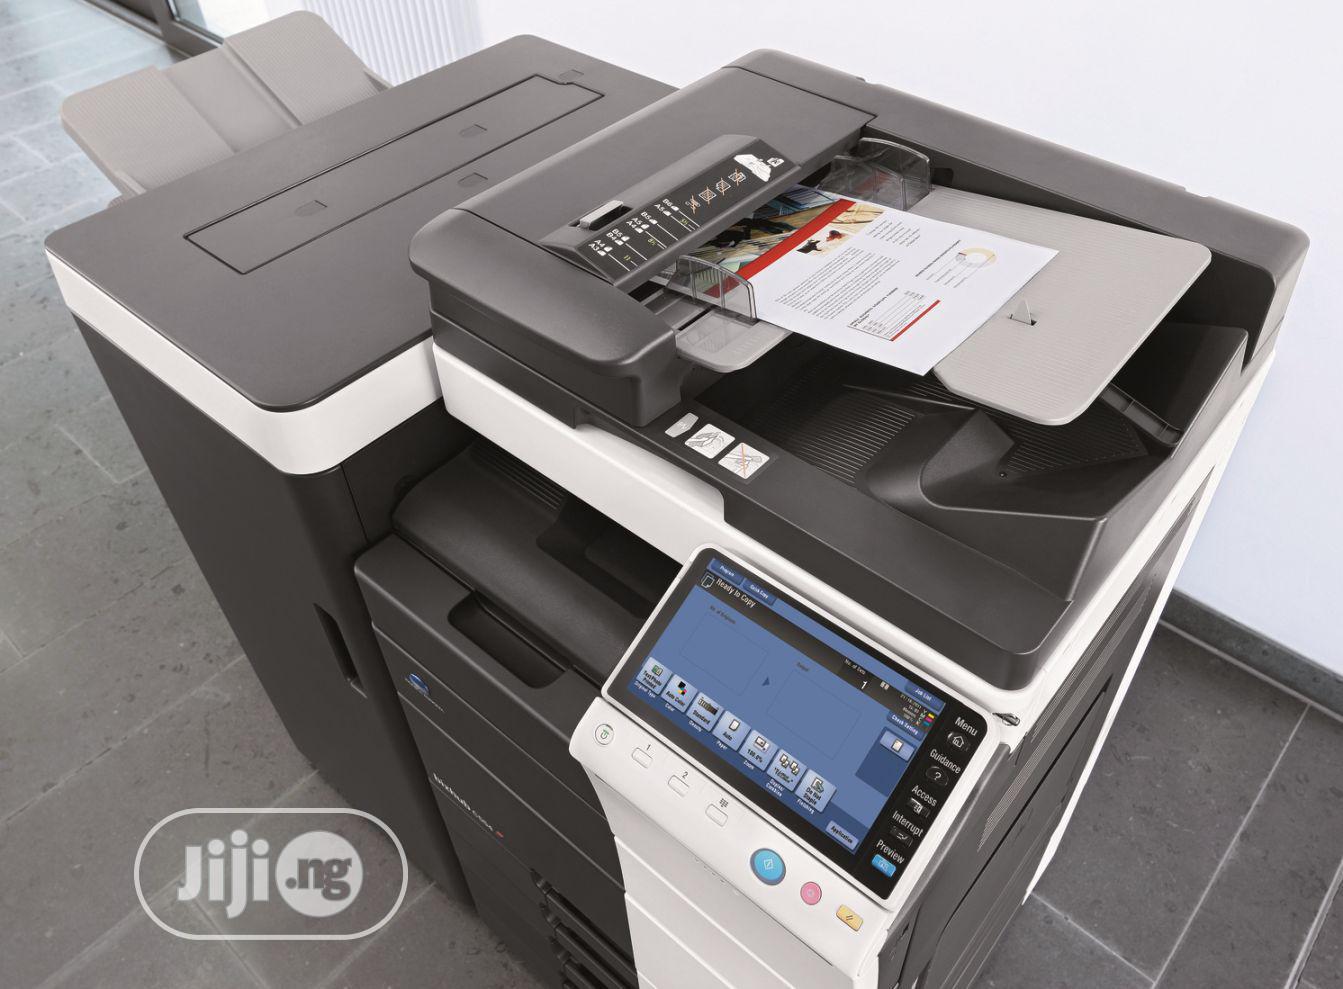 Konica Minolta Direct Image Printer C754 | Printers & Scanners for sale in Ikeja, Lagos State, Nigeria